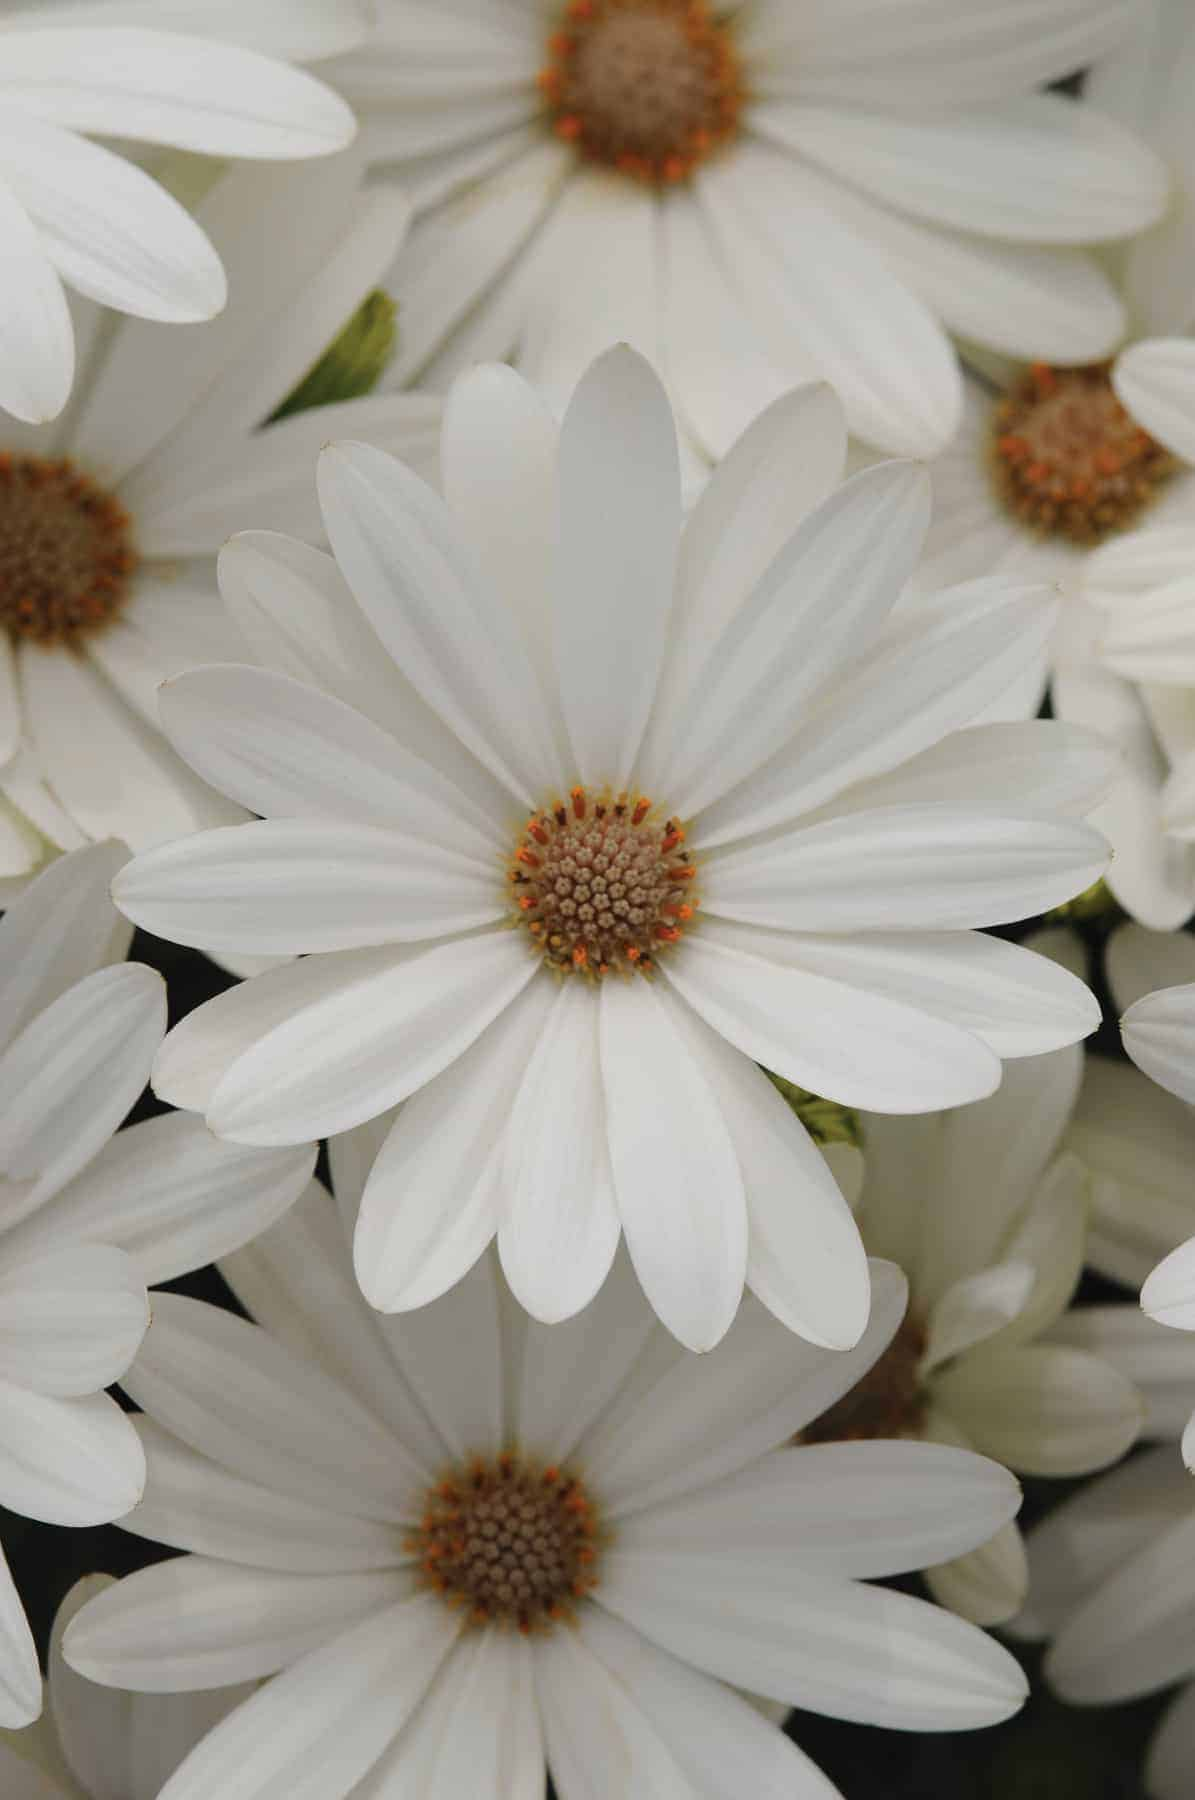 Osteospermum akila daisy white f1 all america selections osteospermum akila daisy white f1 2014 aas bedding plant award winner white osteospermums are not izmirmasajfo